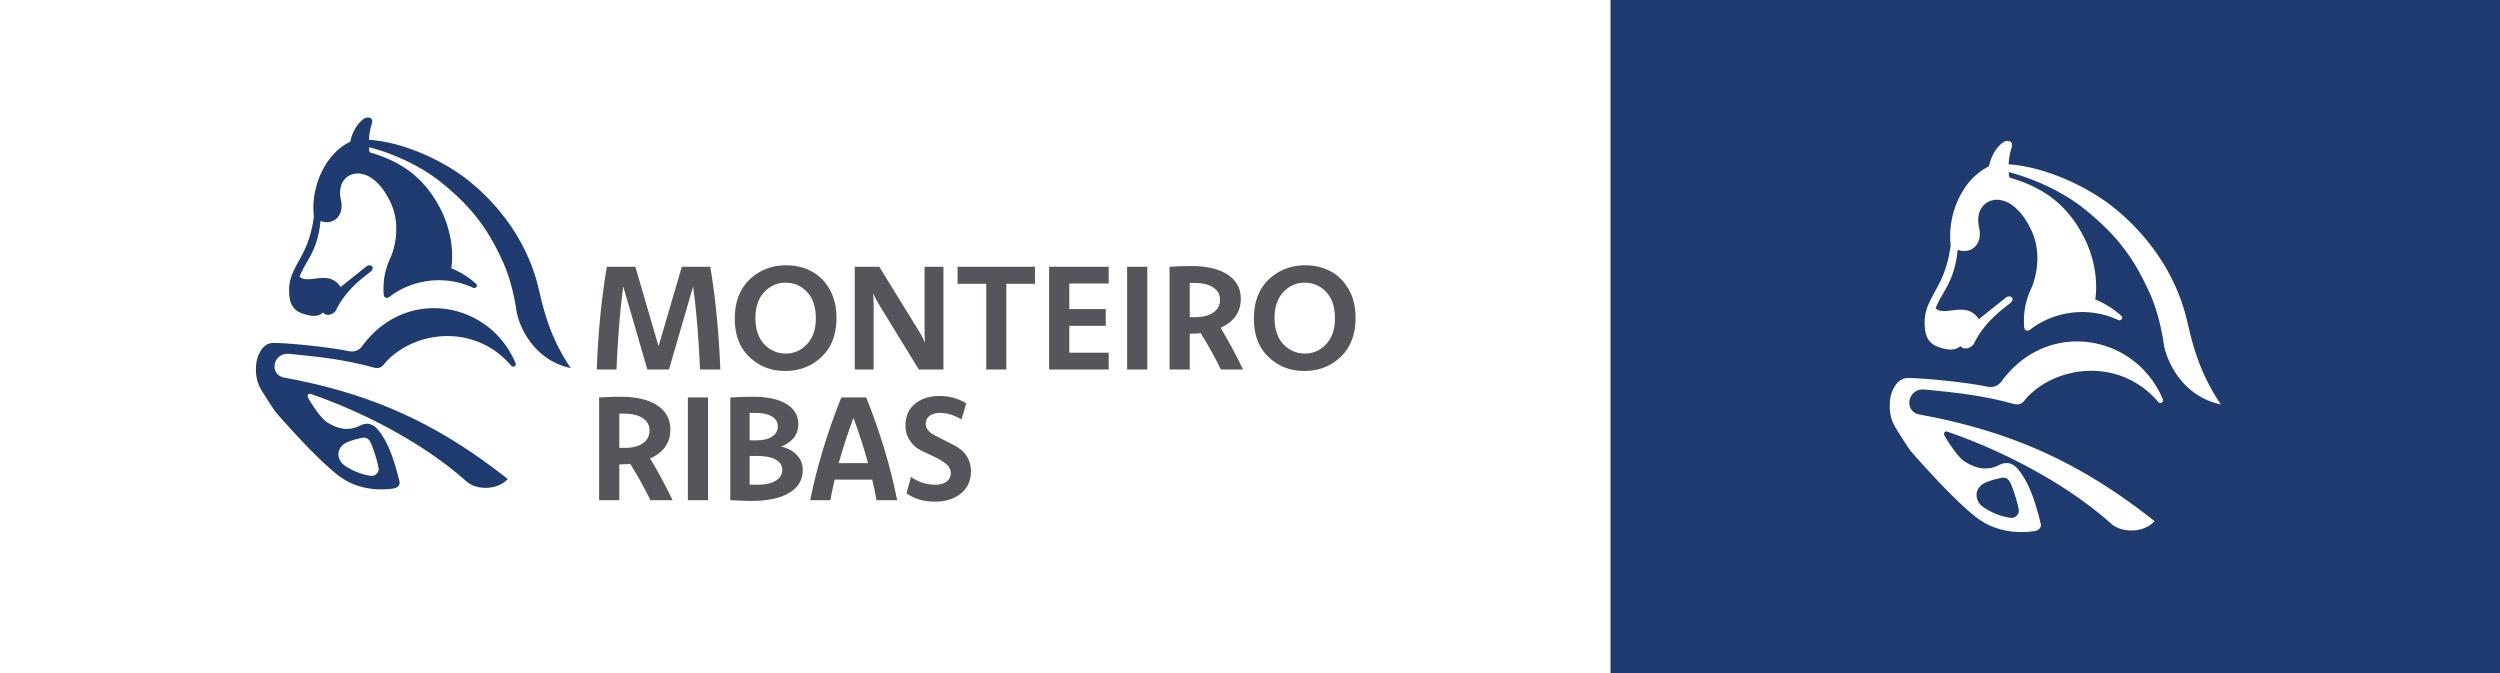 logotipo Monteiro Ribas